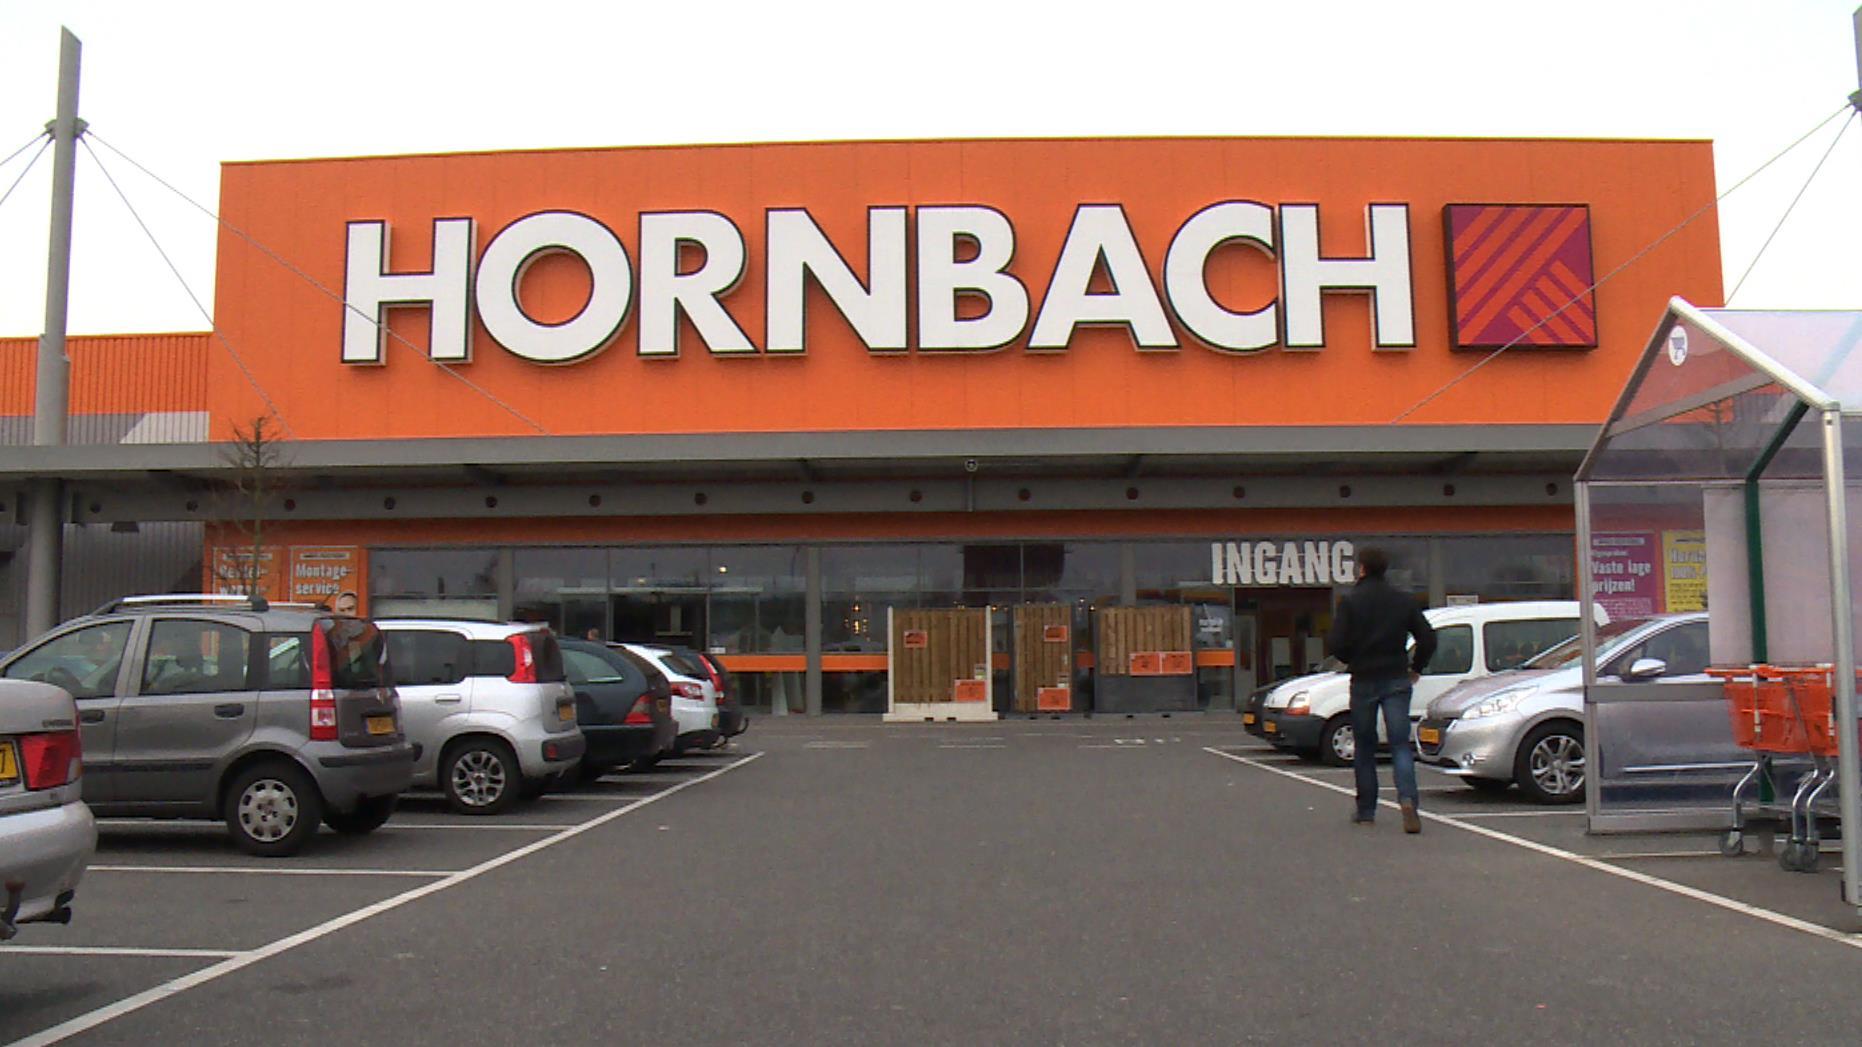 Hornbach Kiel hornbach on feedyeti com